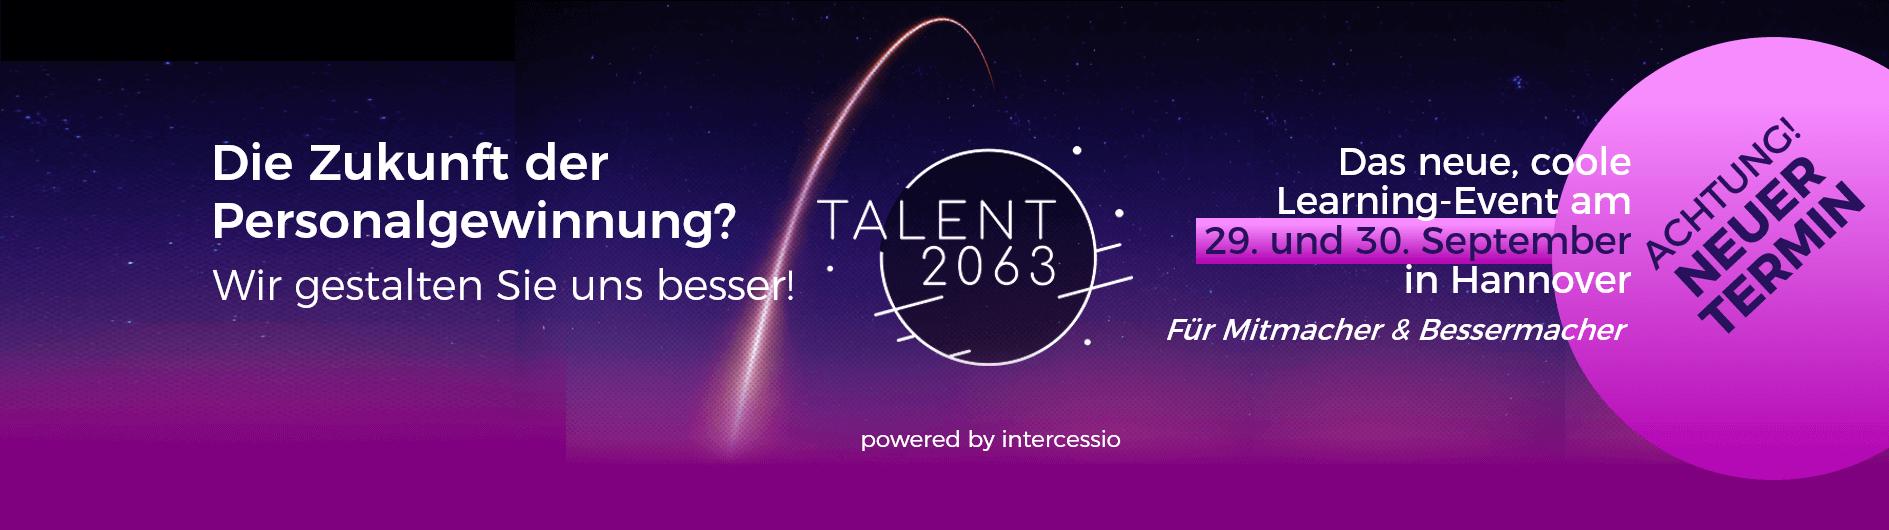 Talent2063 - das innovative Social Learning Event zur Zukunft der Personalgewinnung